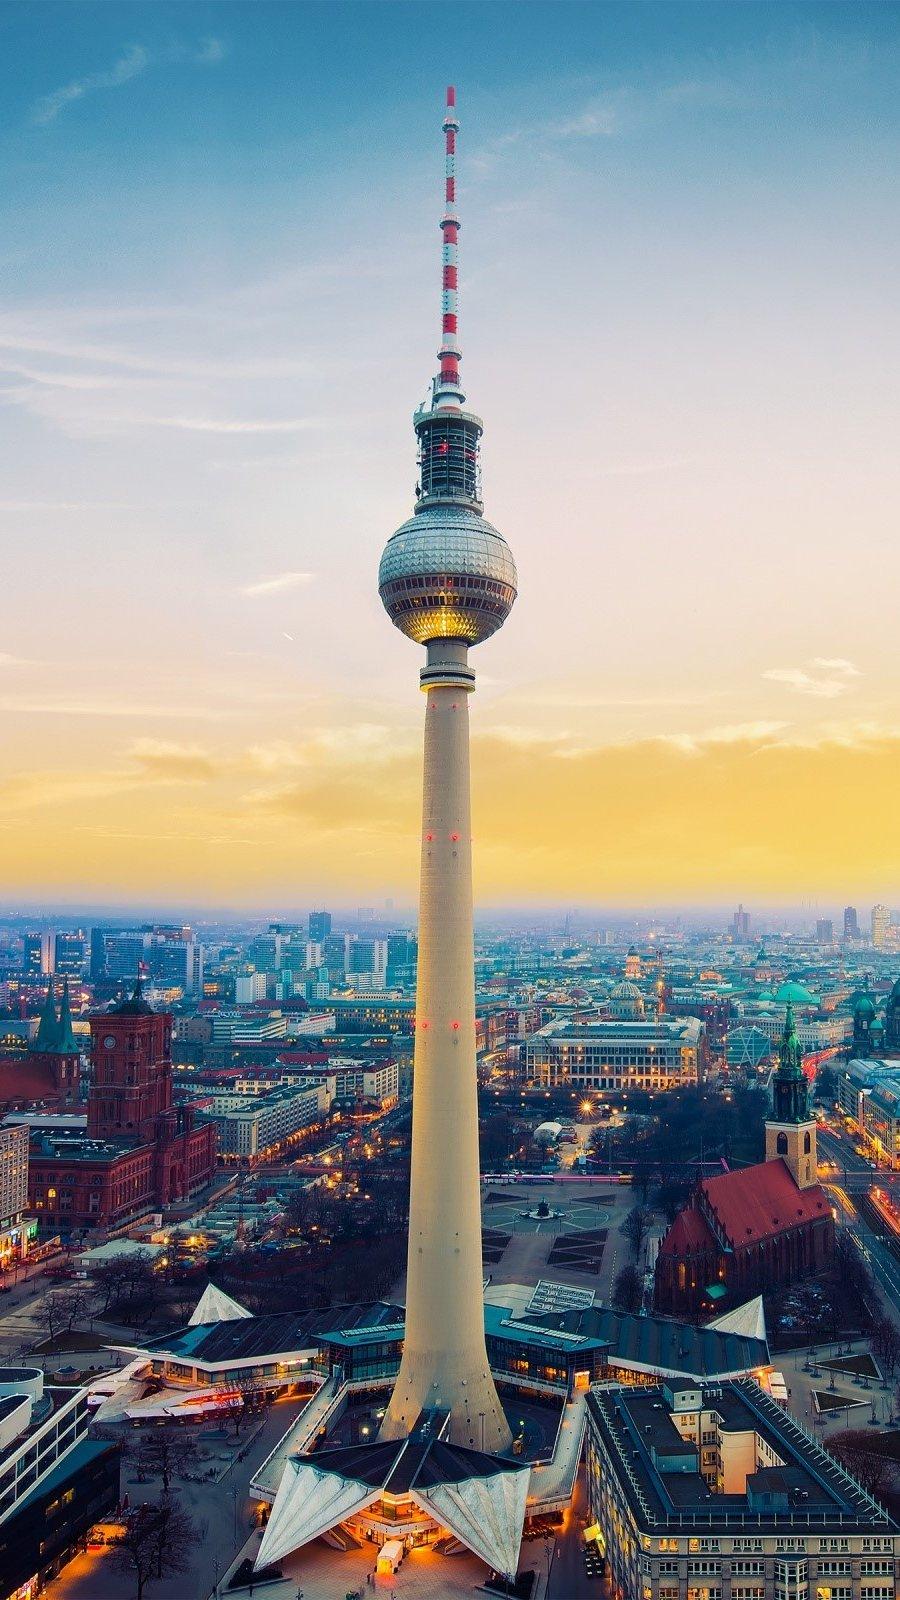 Fondos de pantalla Torre Fernsehturm en Berlin Vertical